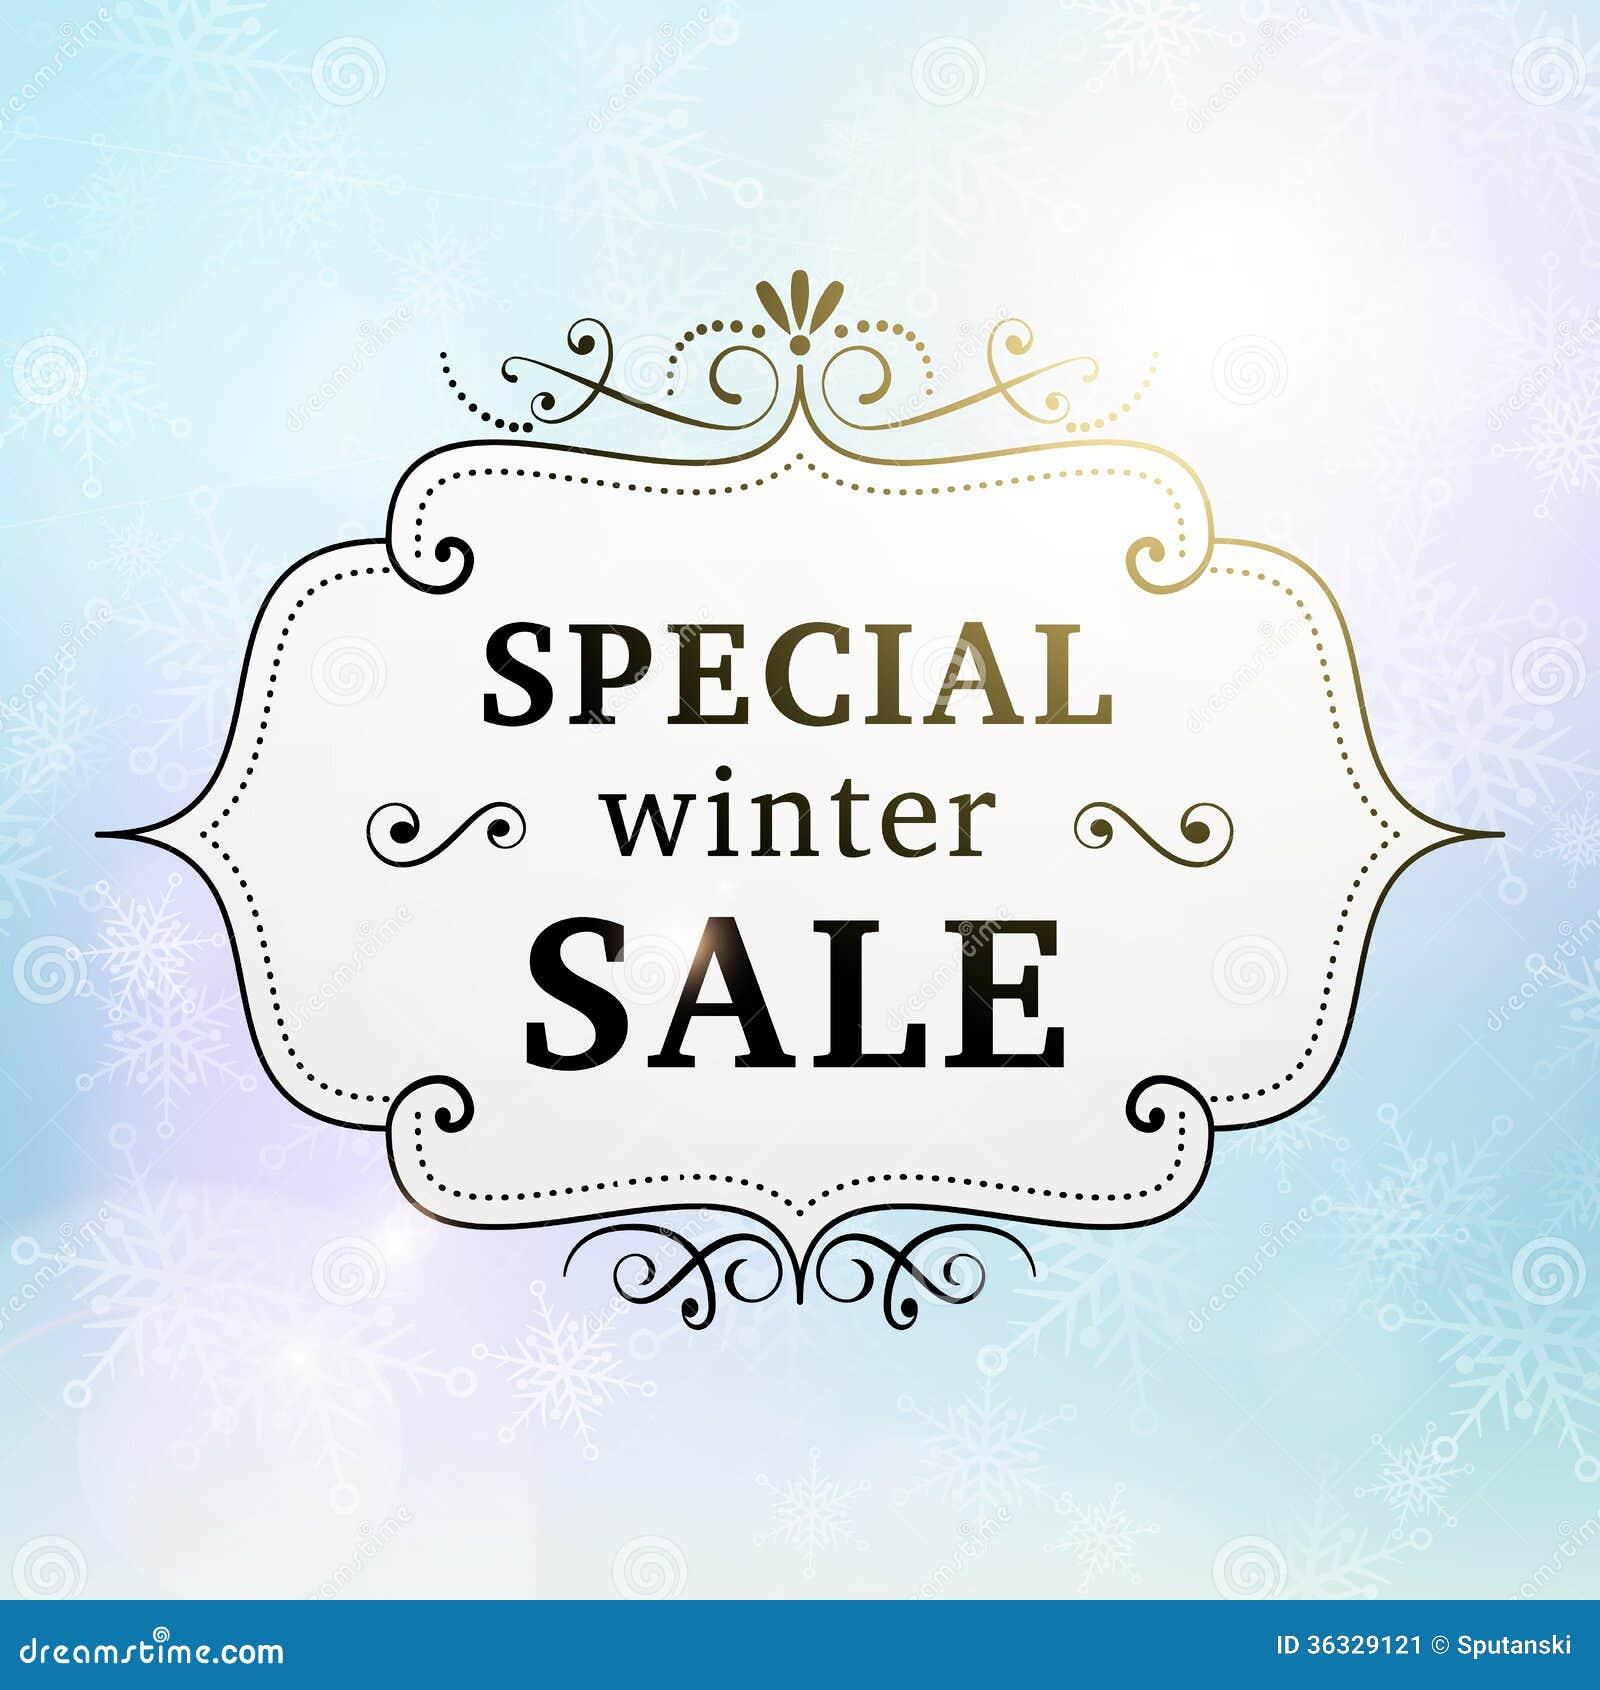 winter special sale retro poster stock vector